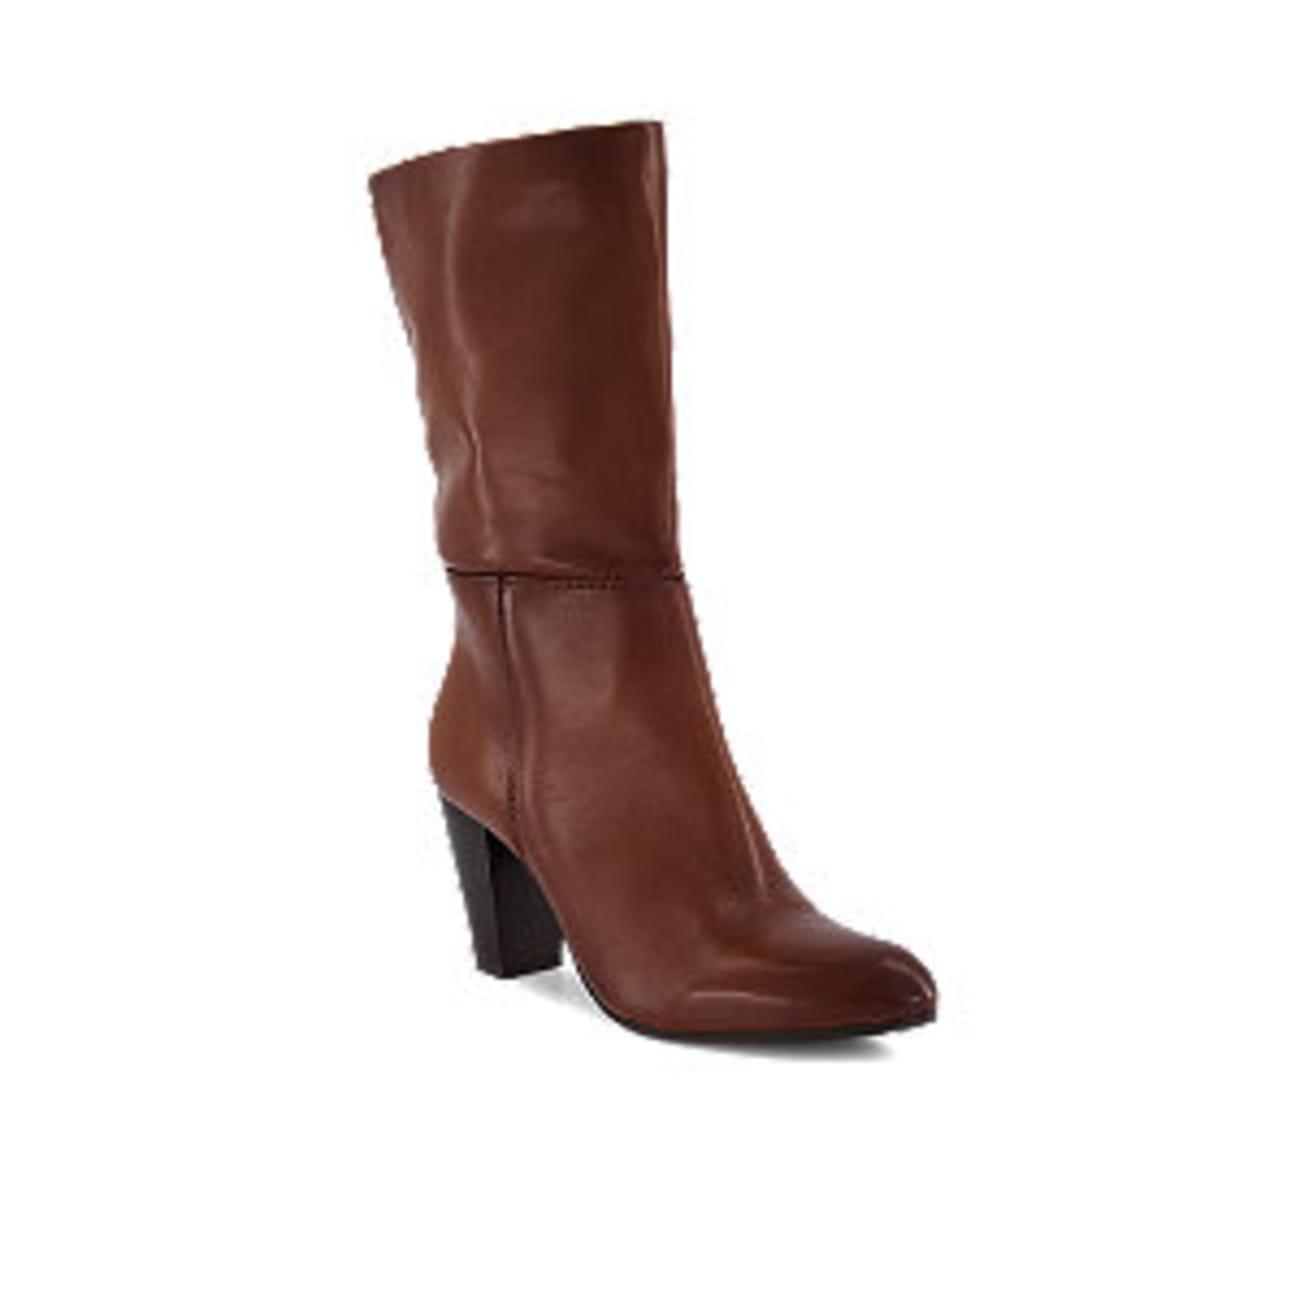 Varese Coco Damen Stiefelette | Varese Schuhe mit